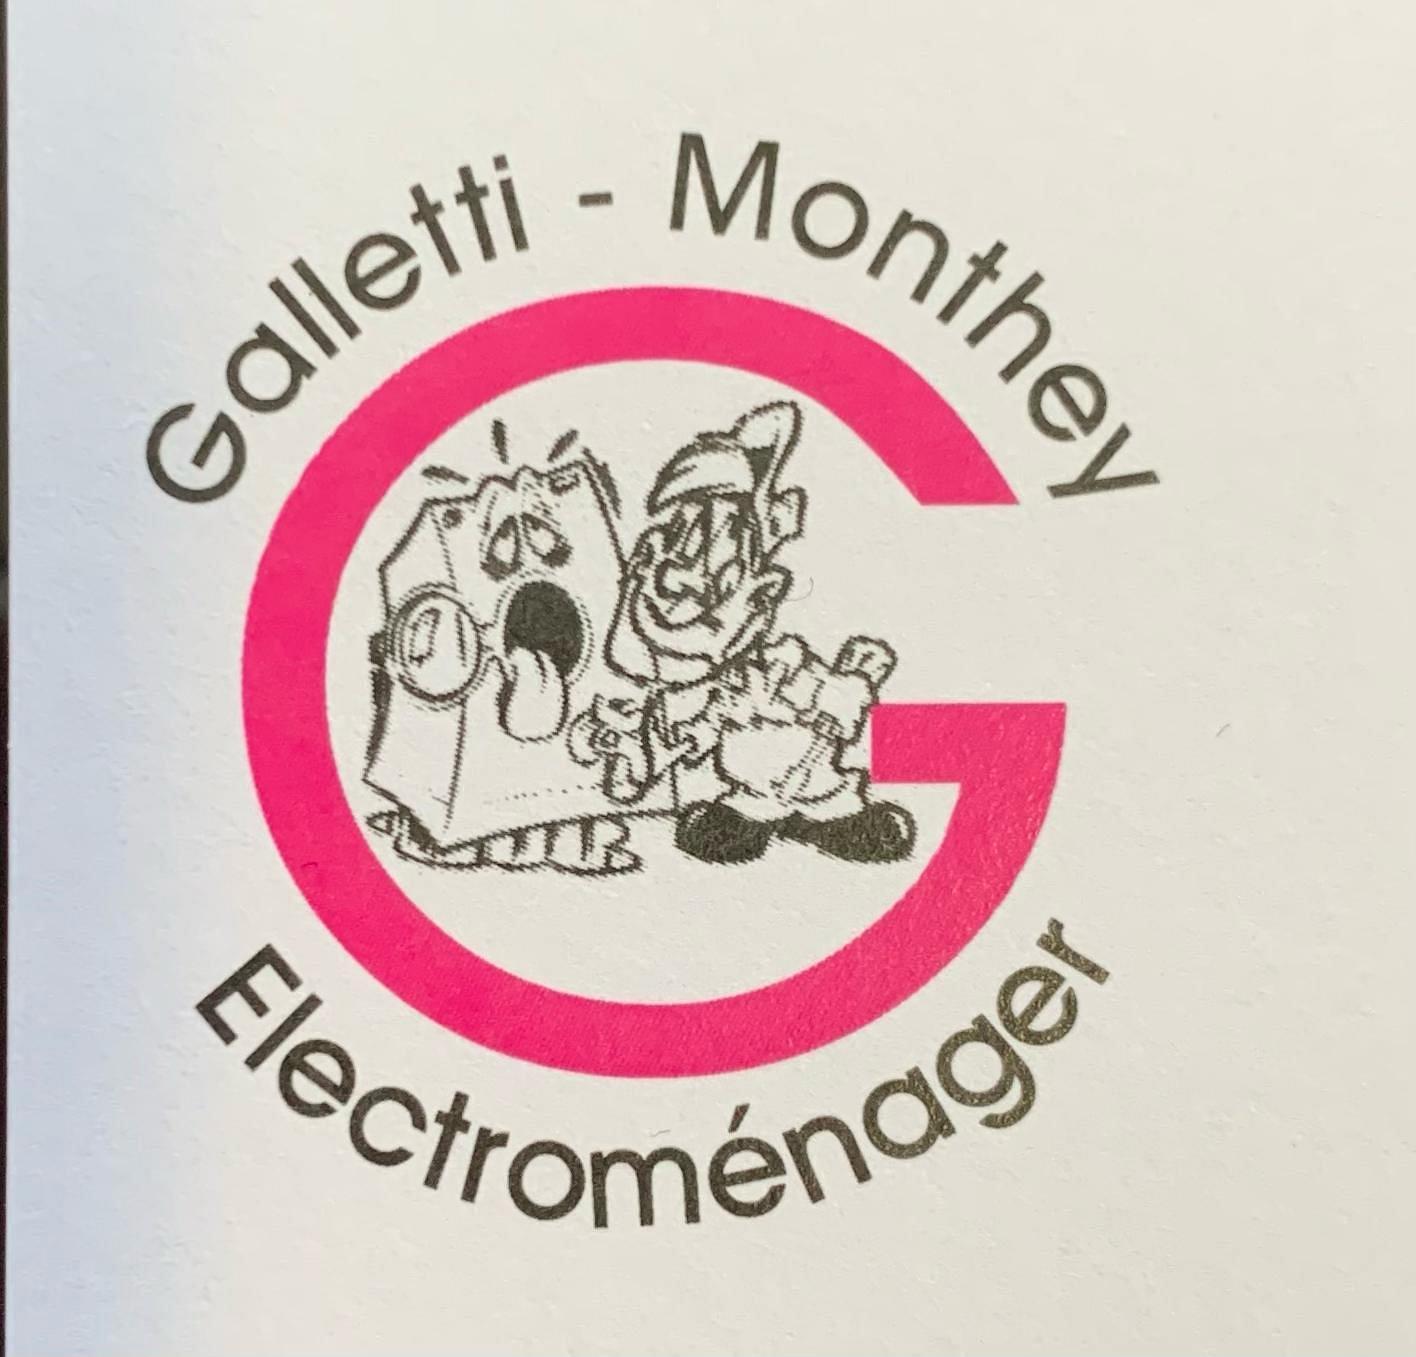 Galletti Electroménager Sàrl